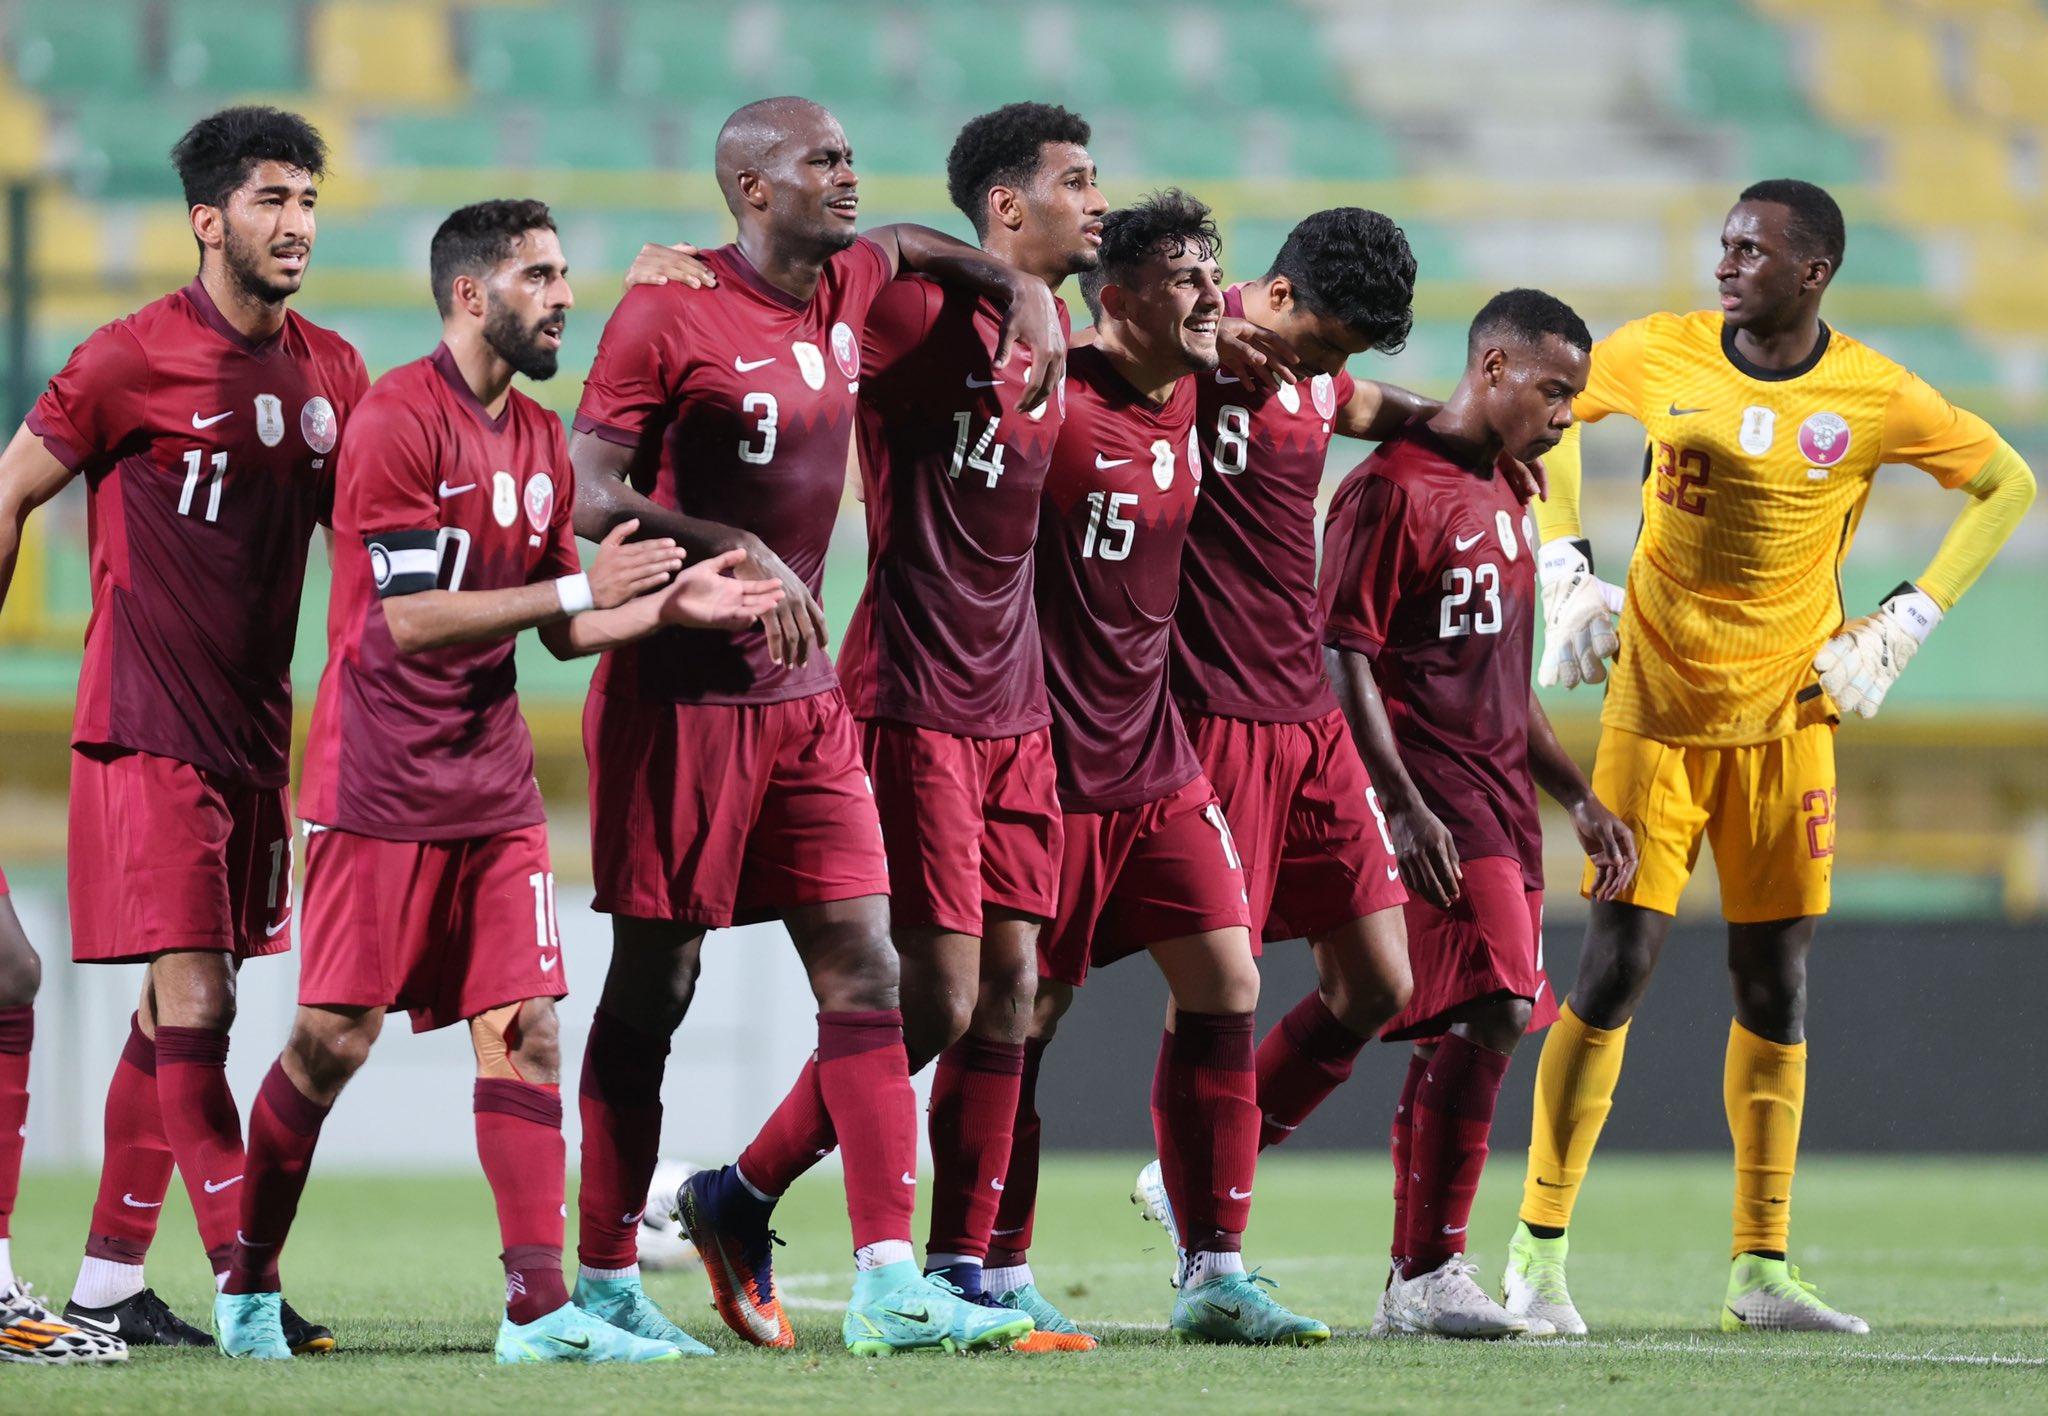 Qatar Wins Friendly Match against El Salvador